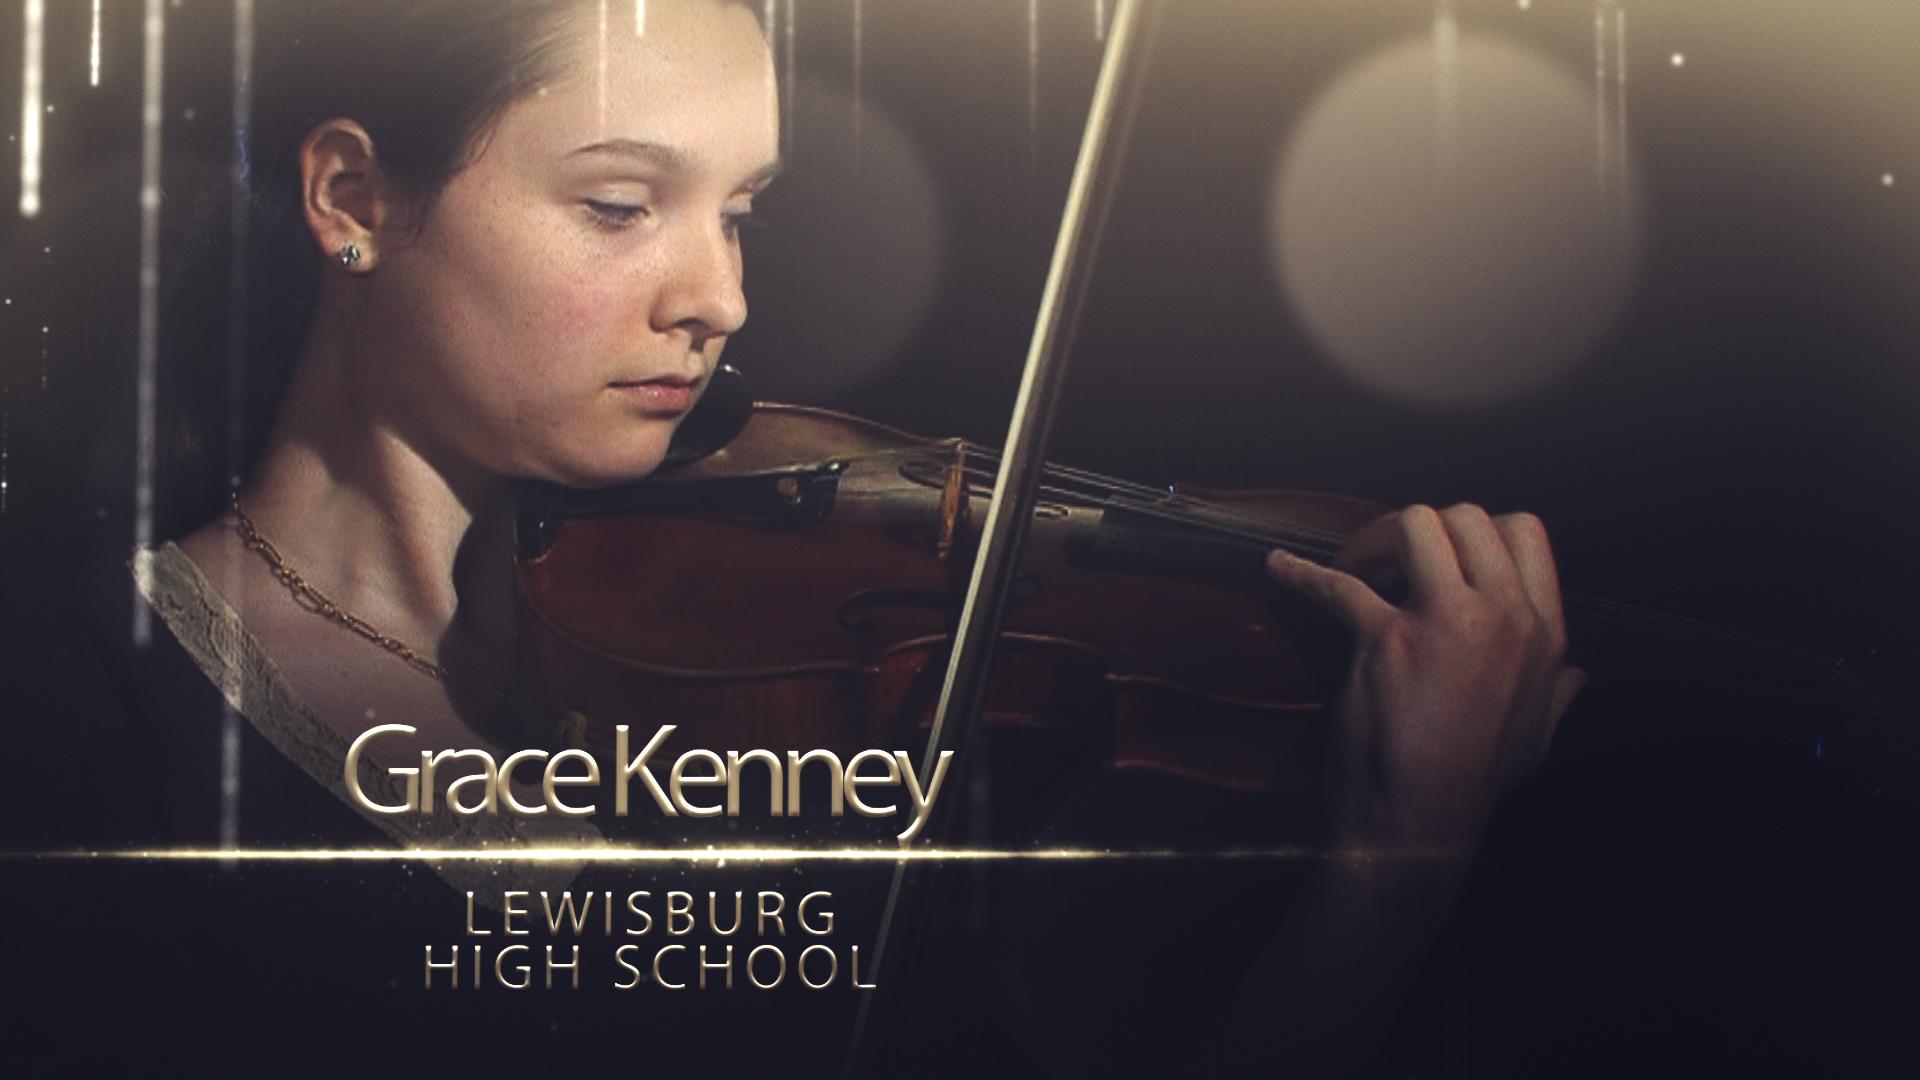 Grace Kenny